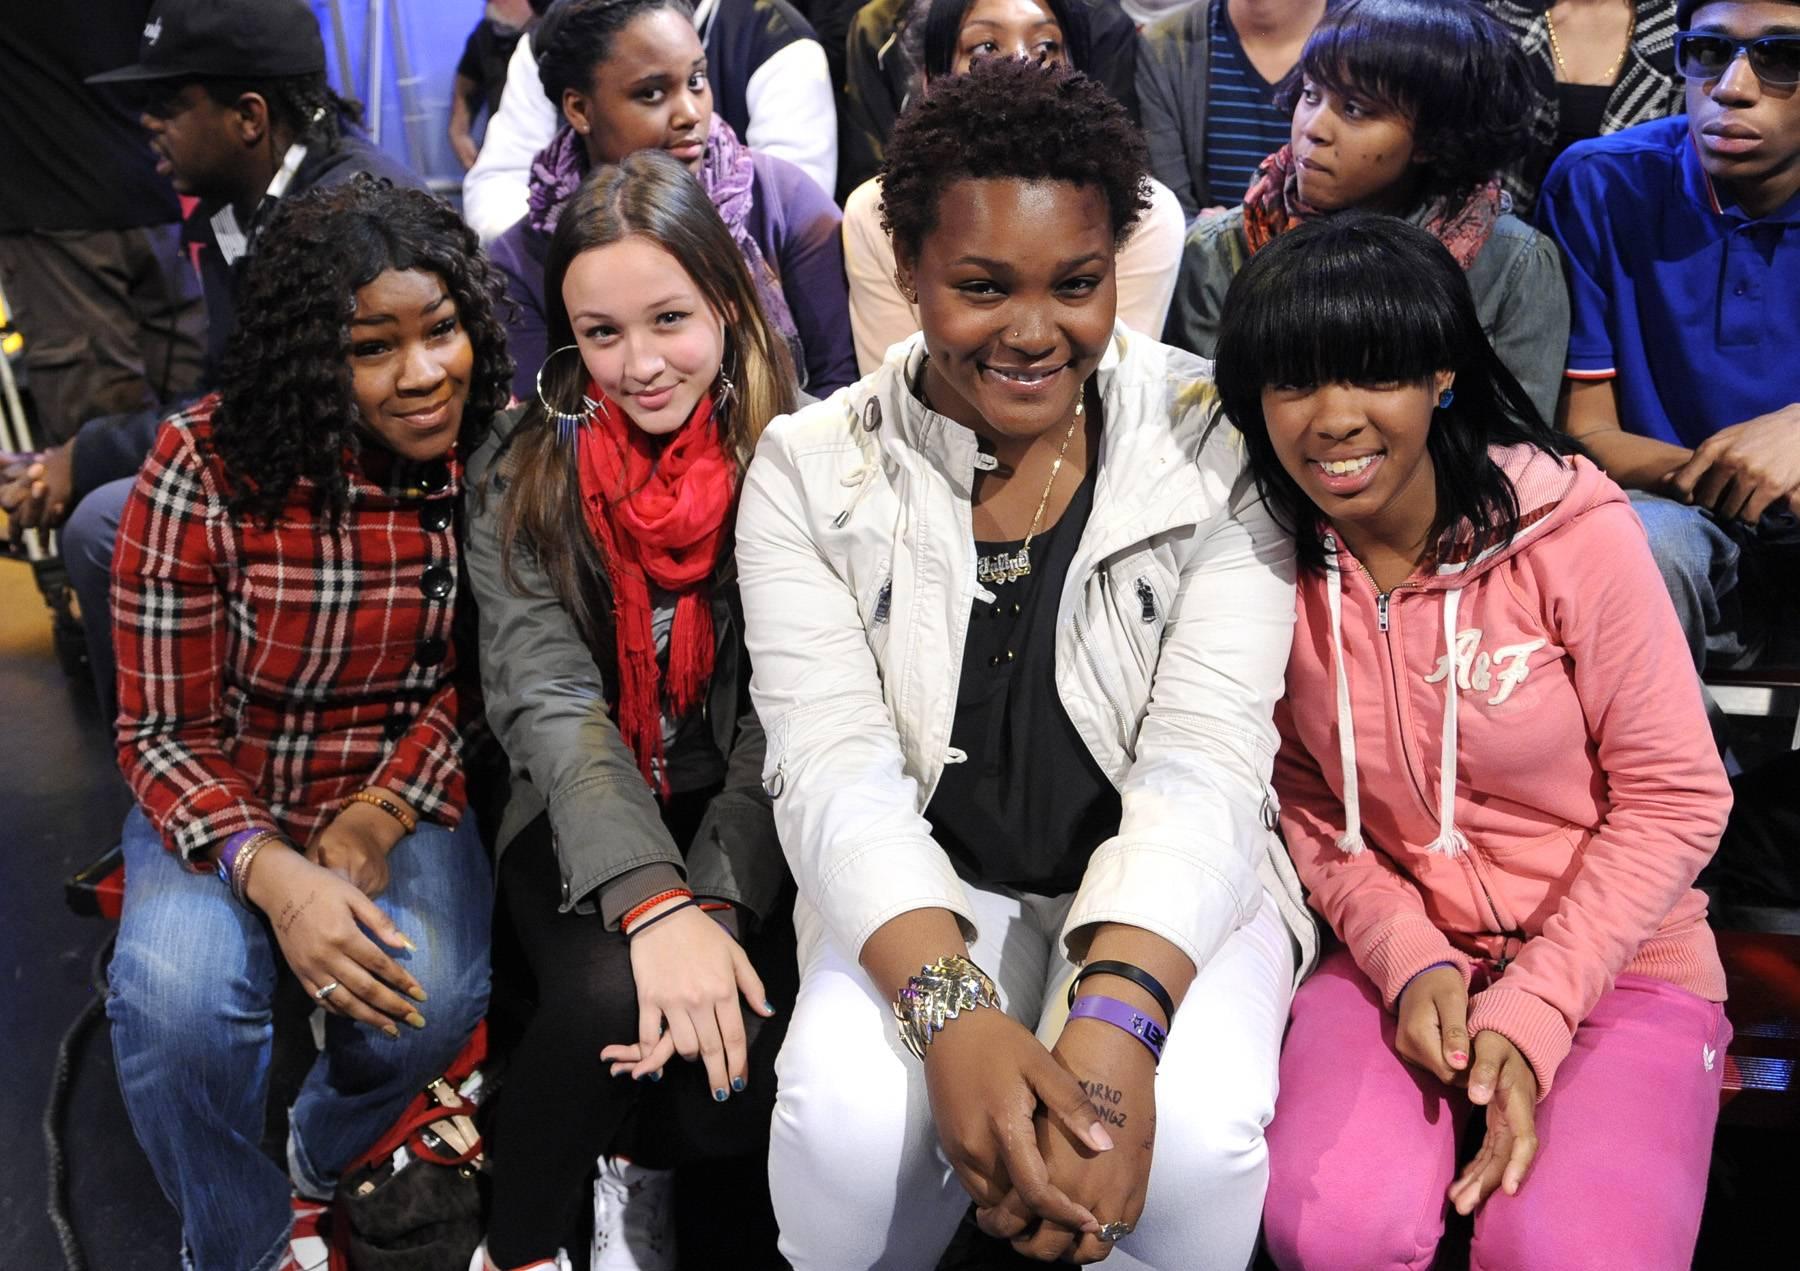 Get Live - Audience members at 106 & Park, May 2, 2012. (Photo: John Ricard/BET)